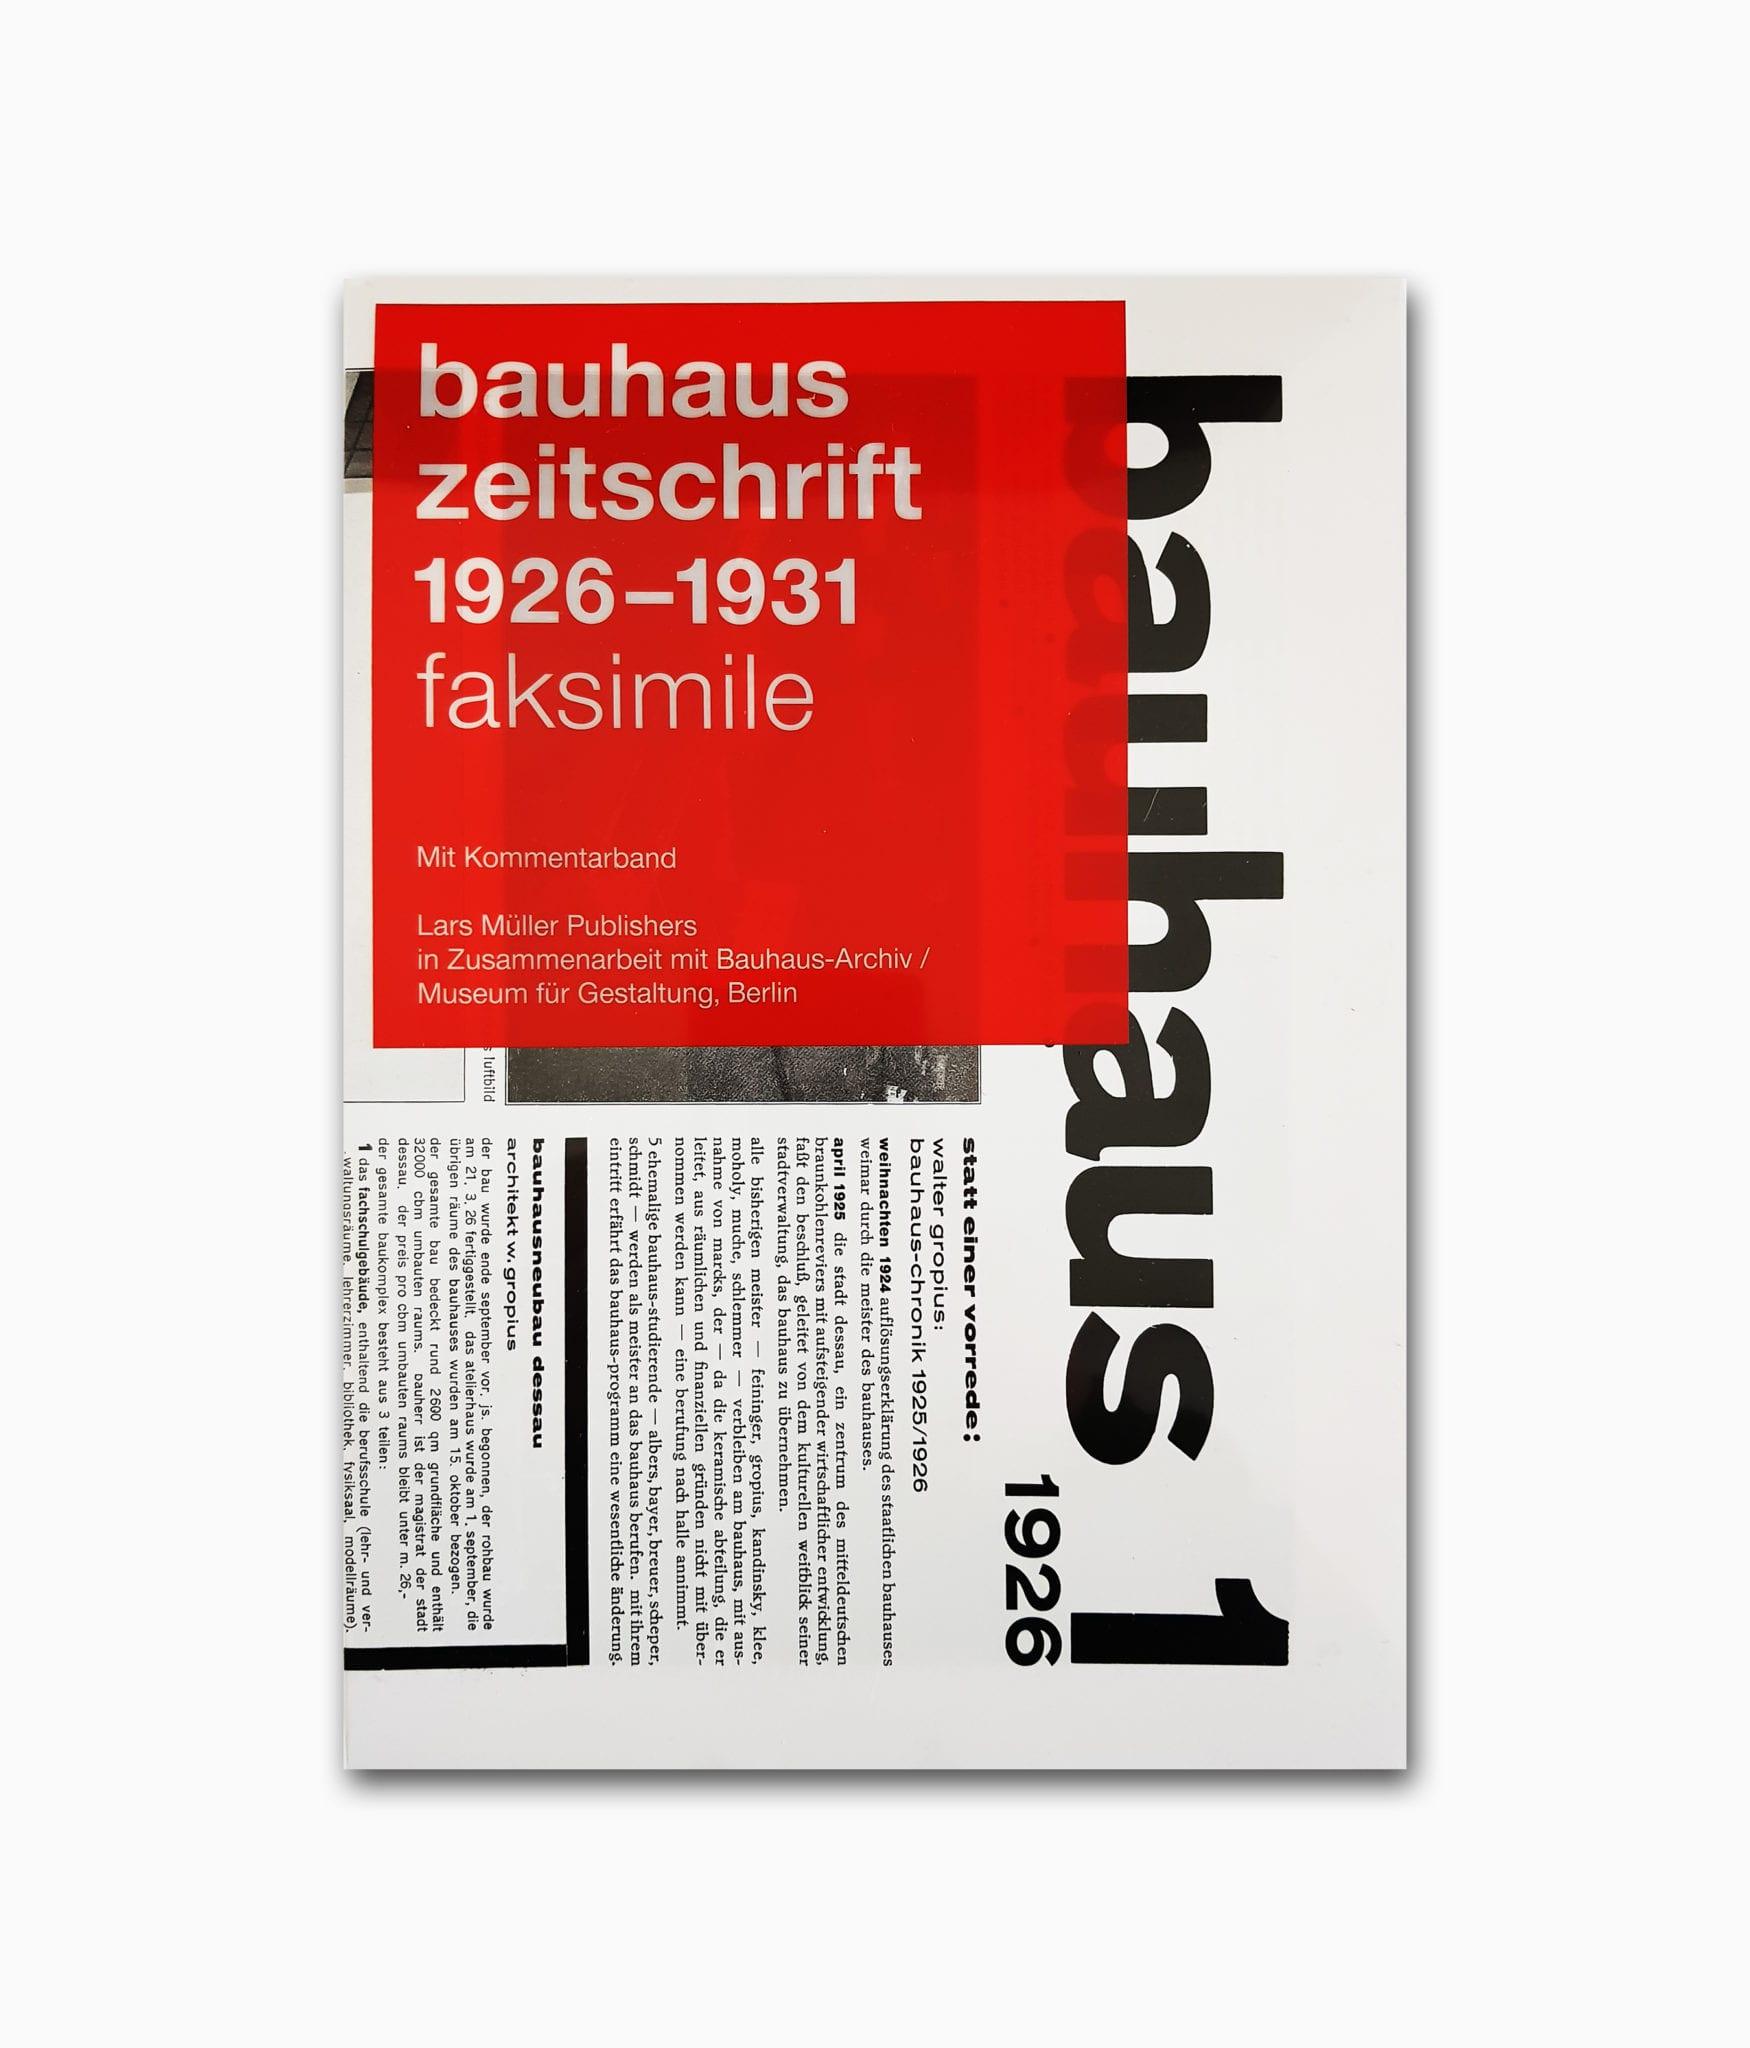 Bauhaus Zeitschrift Lars Müller Publishers Cover